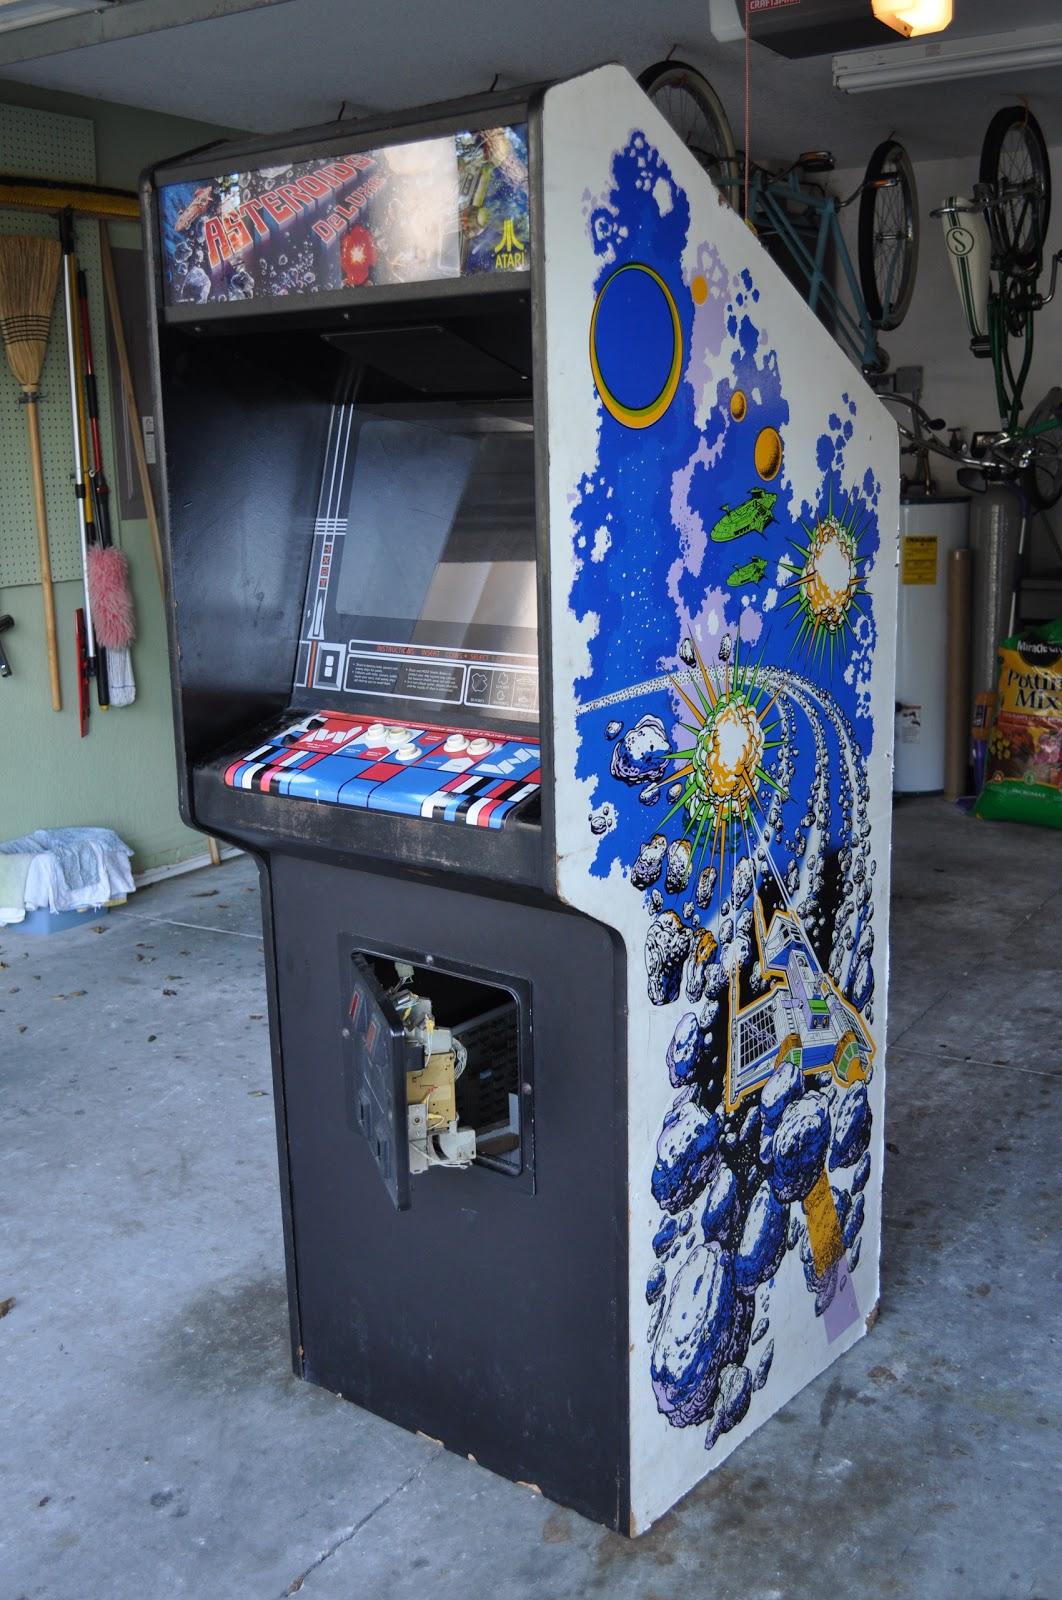 asteroids arcade cabinet - photo #38